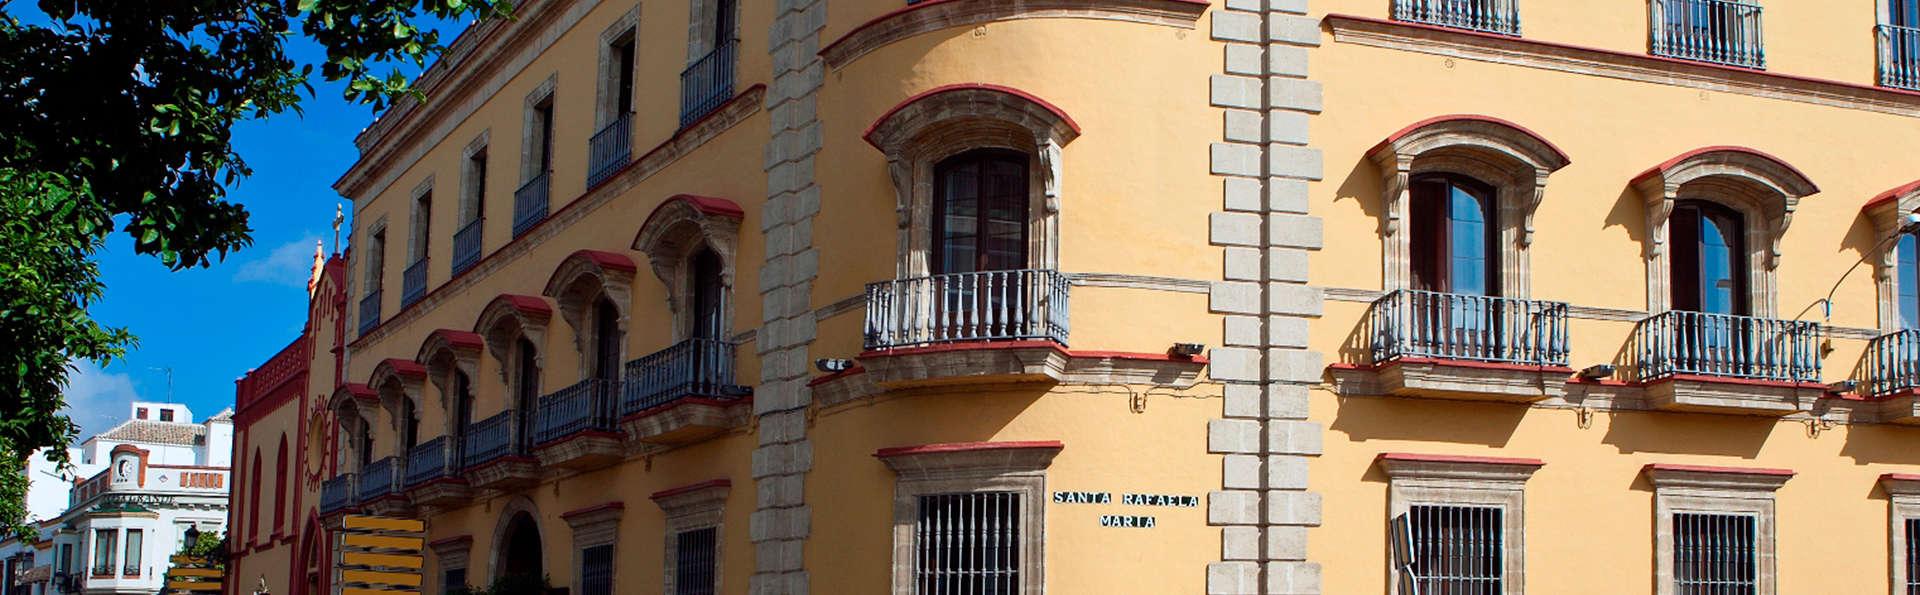 Itaca Hotel Jerez 4 Jerez De La Frontera Espagne